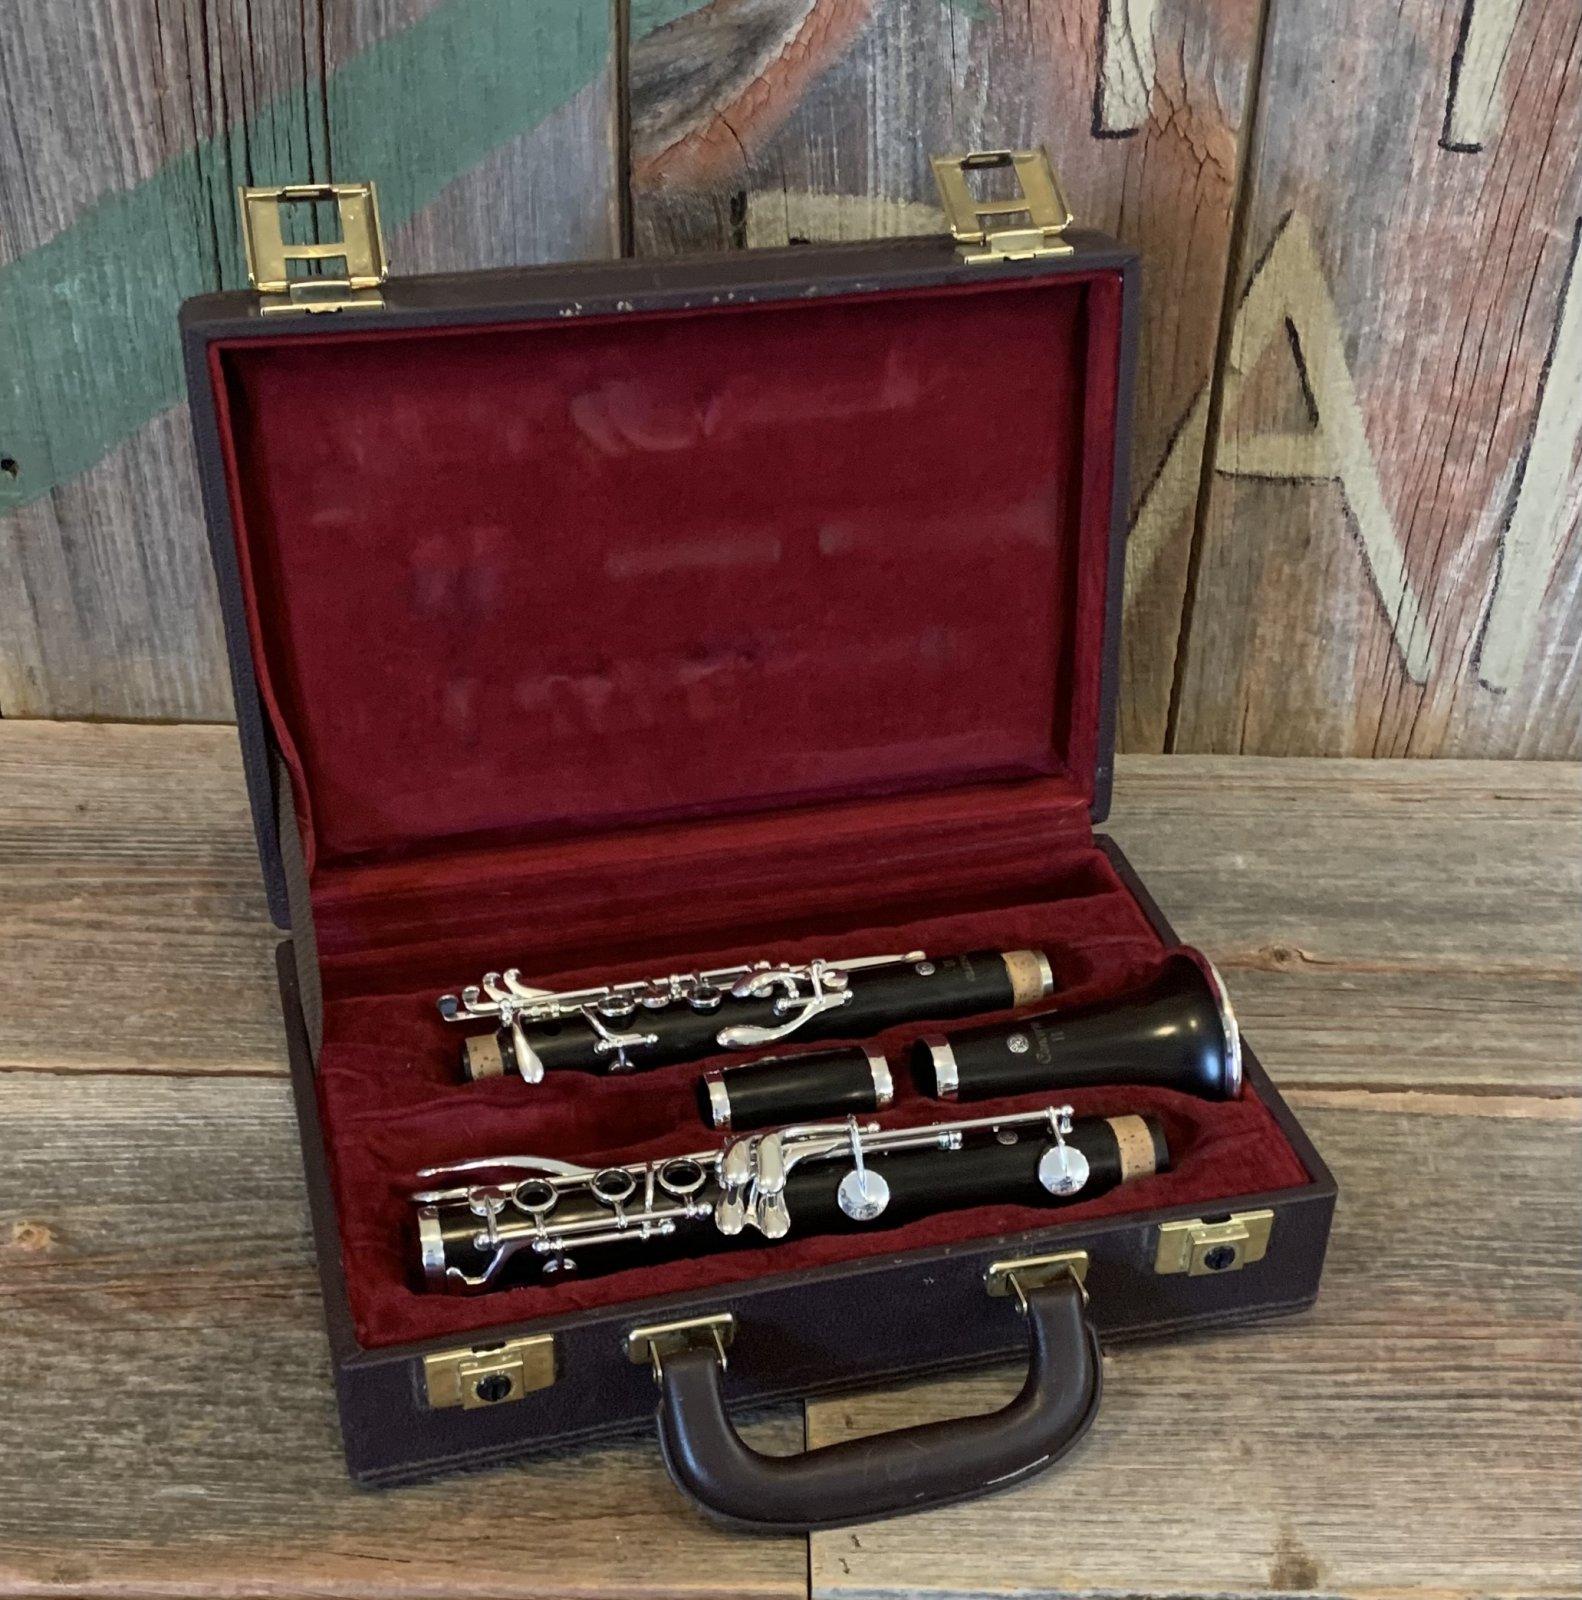 LeBlanc Concerto II Bb Clarinet Wood - Used